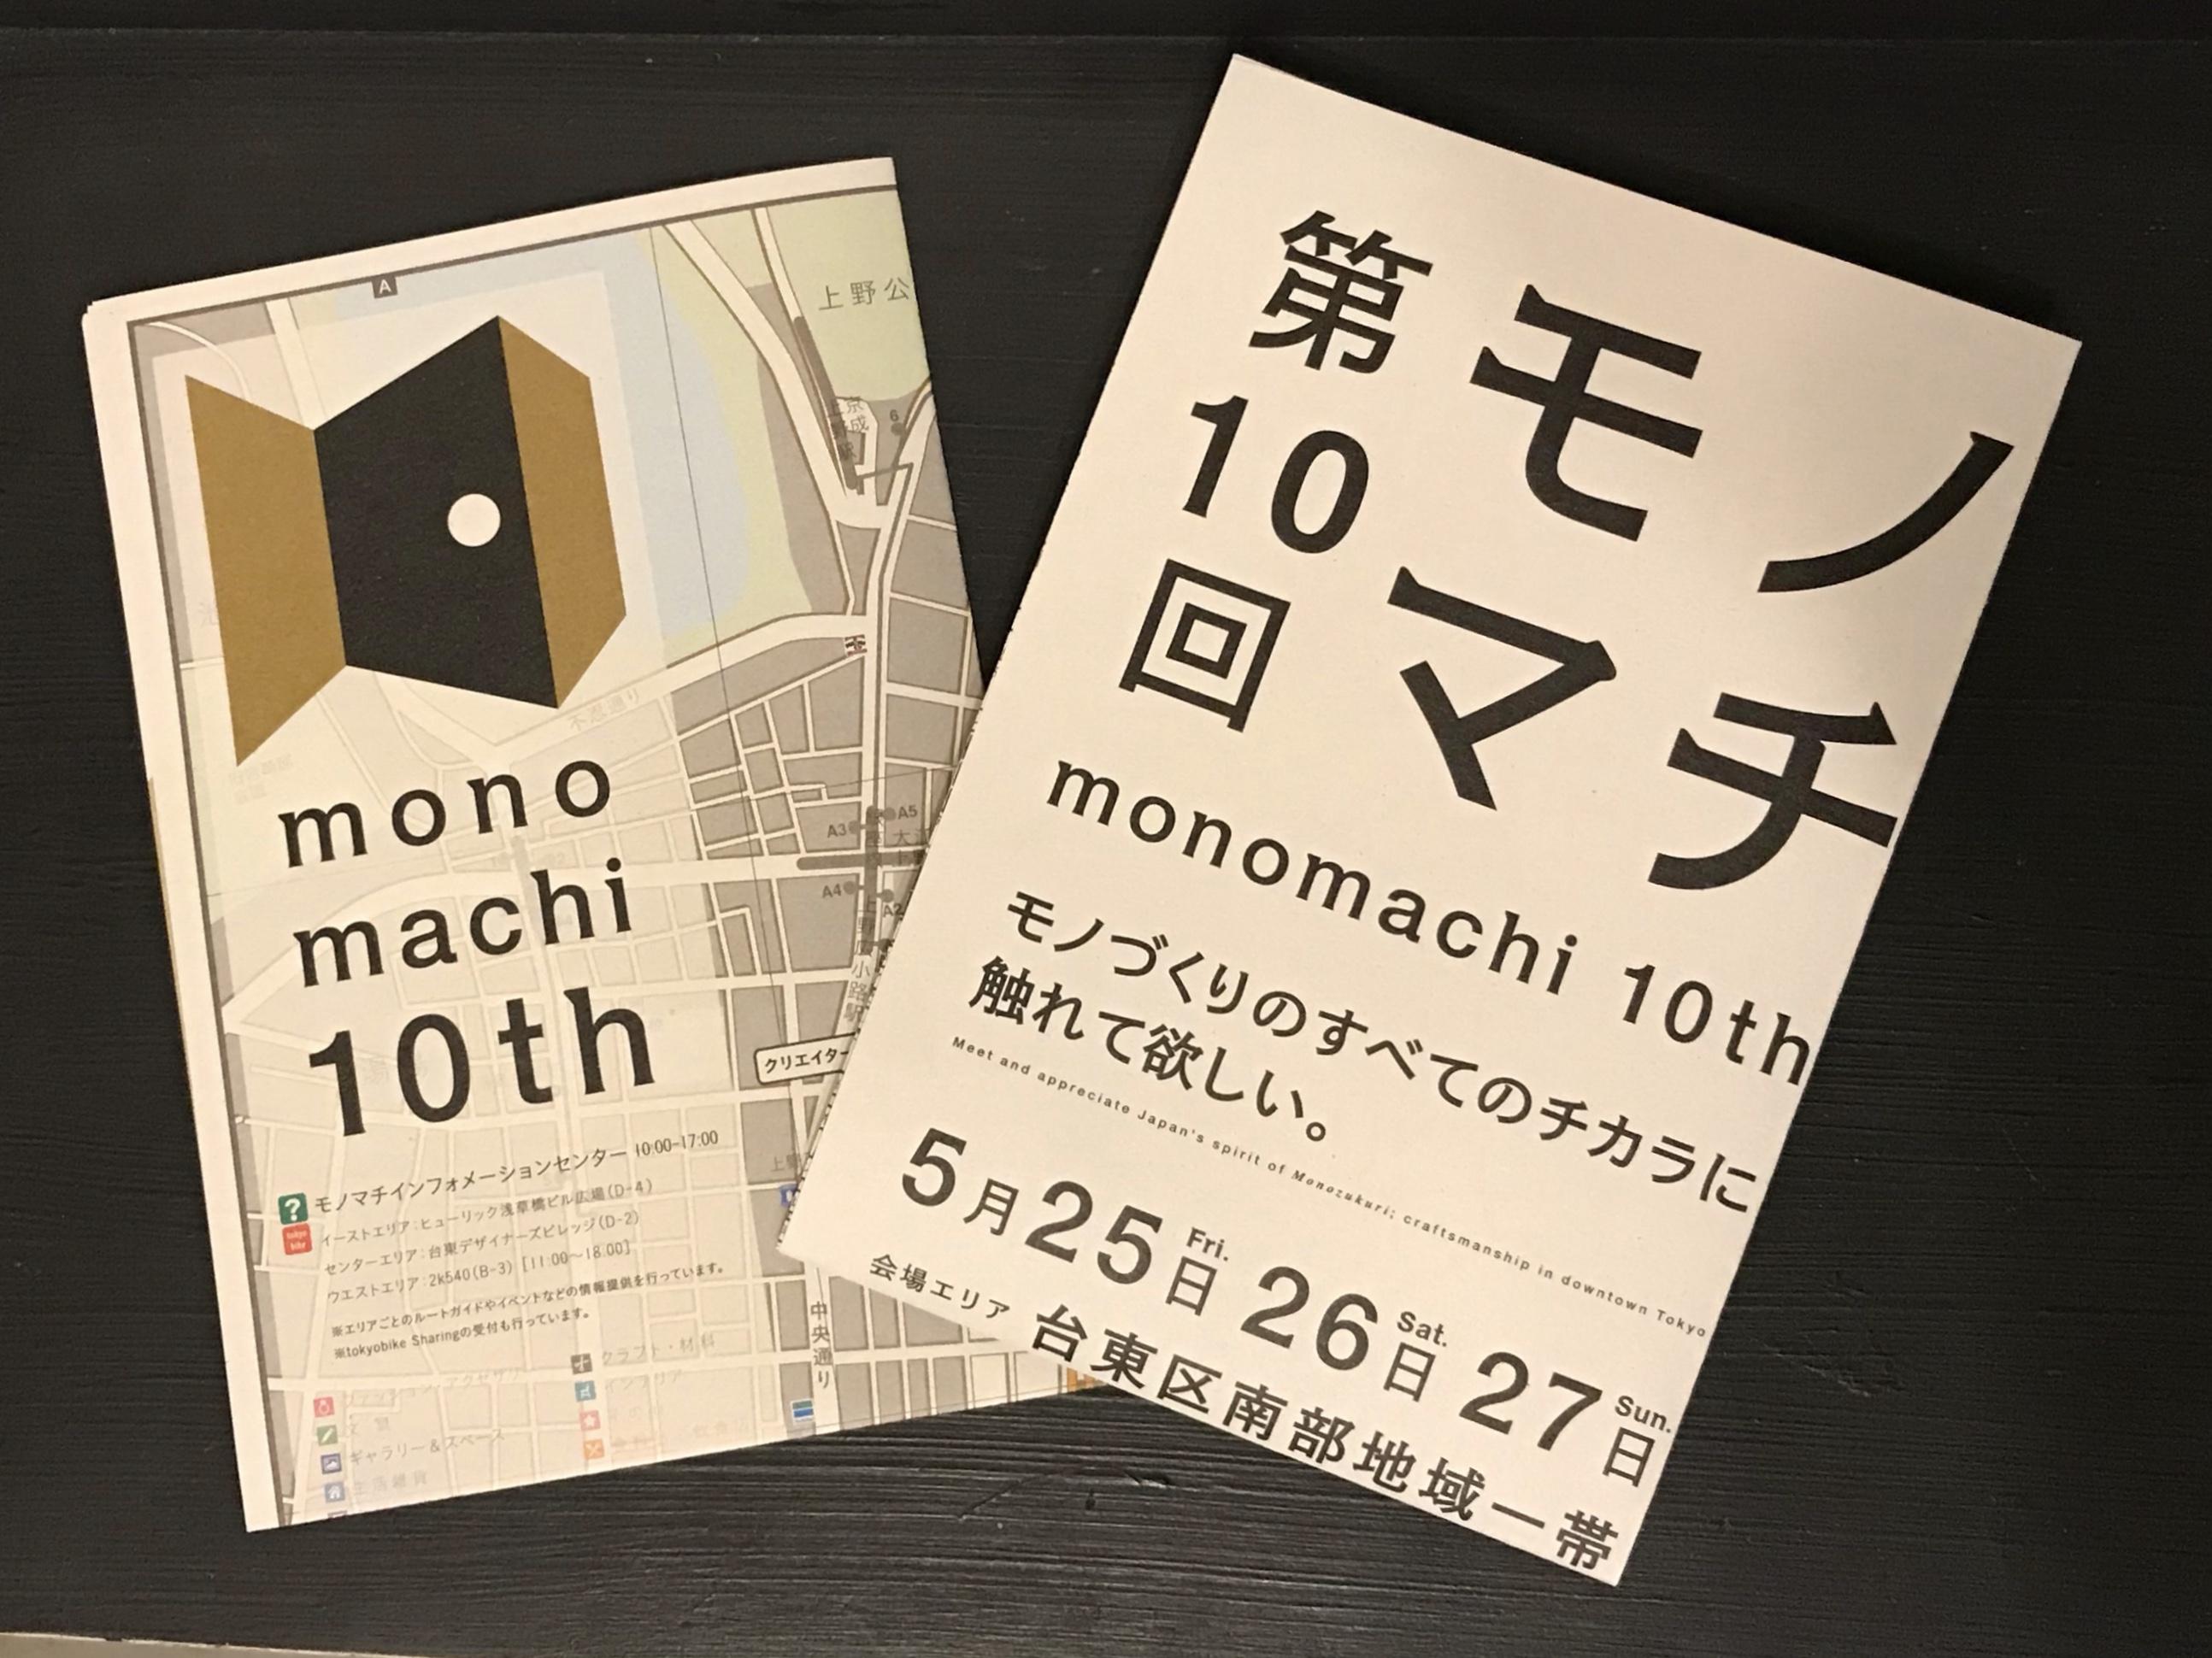 monomachi10th 5/25-27